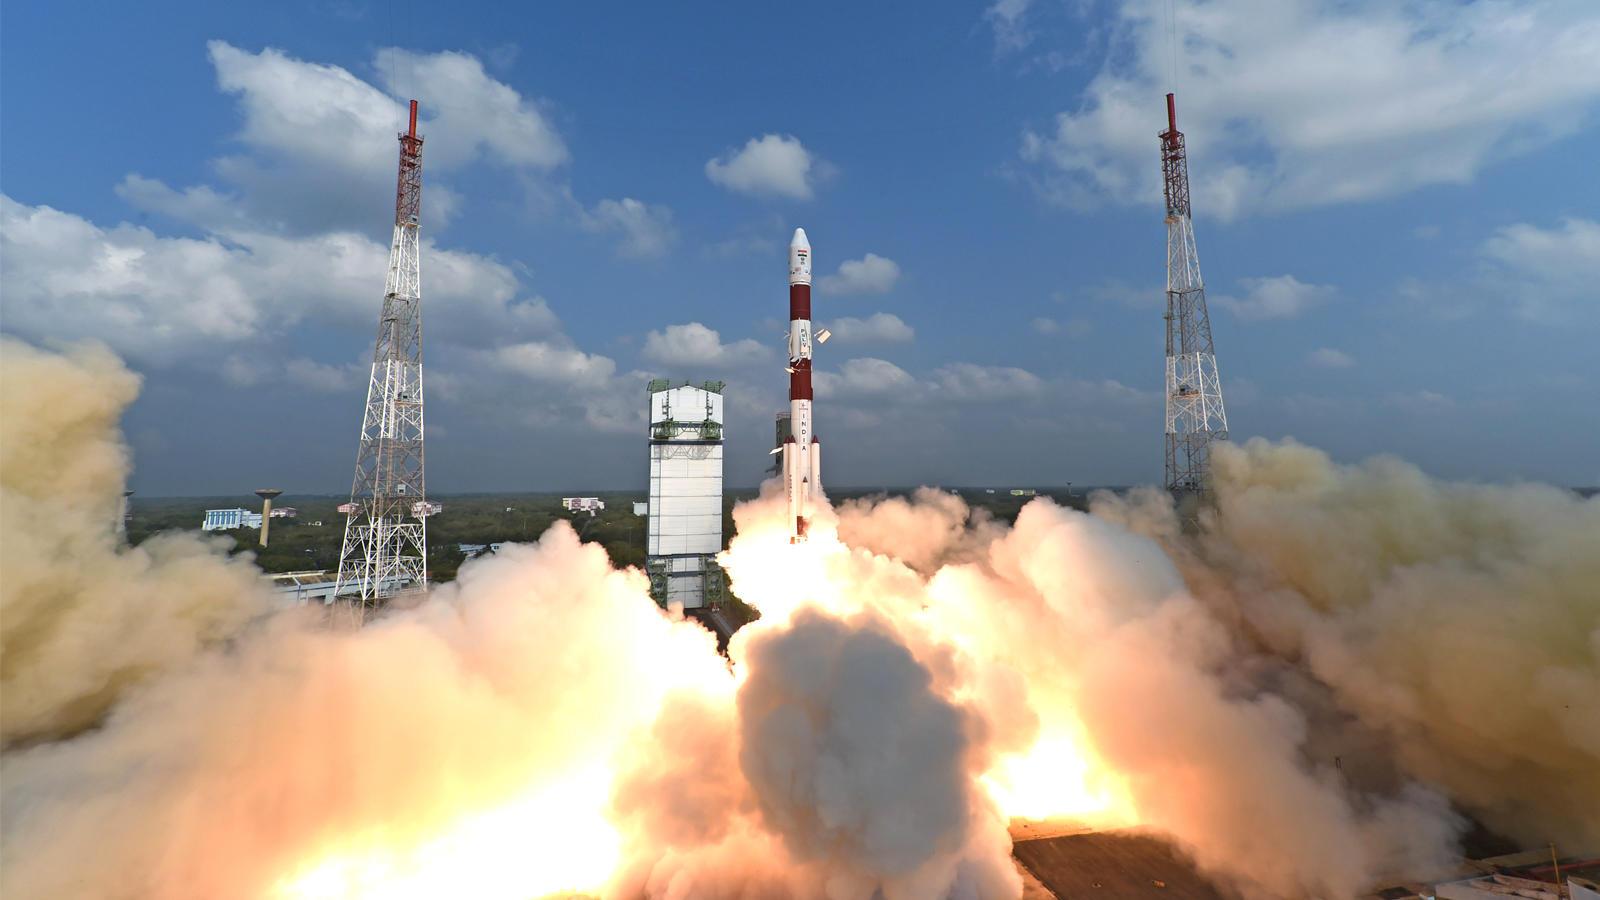 India has two launch pads in Sriharikota